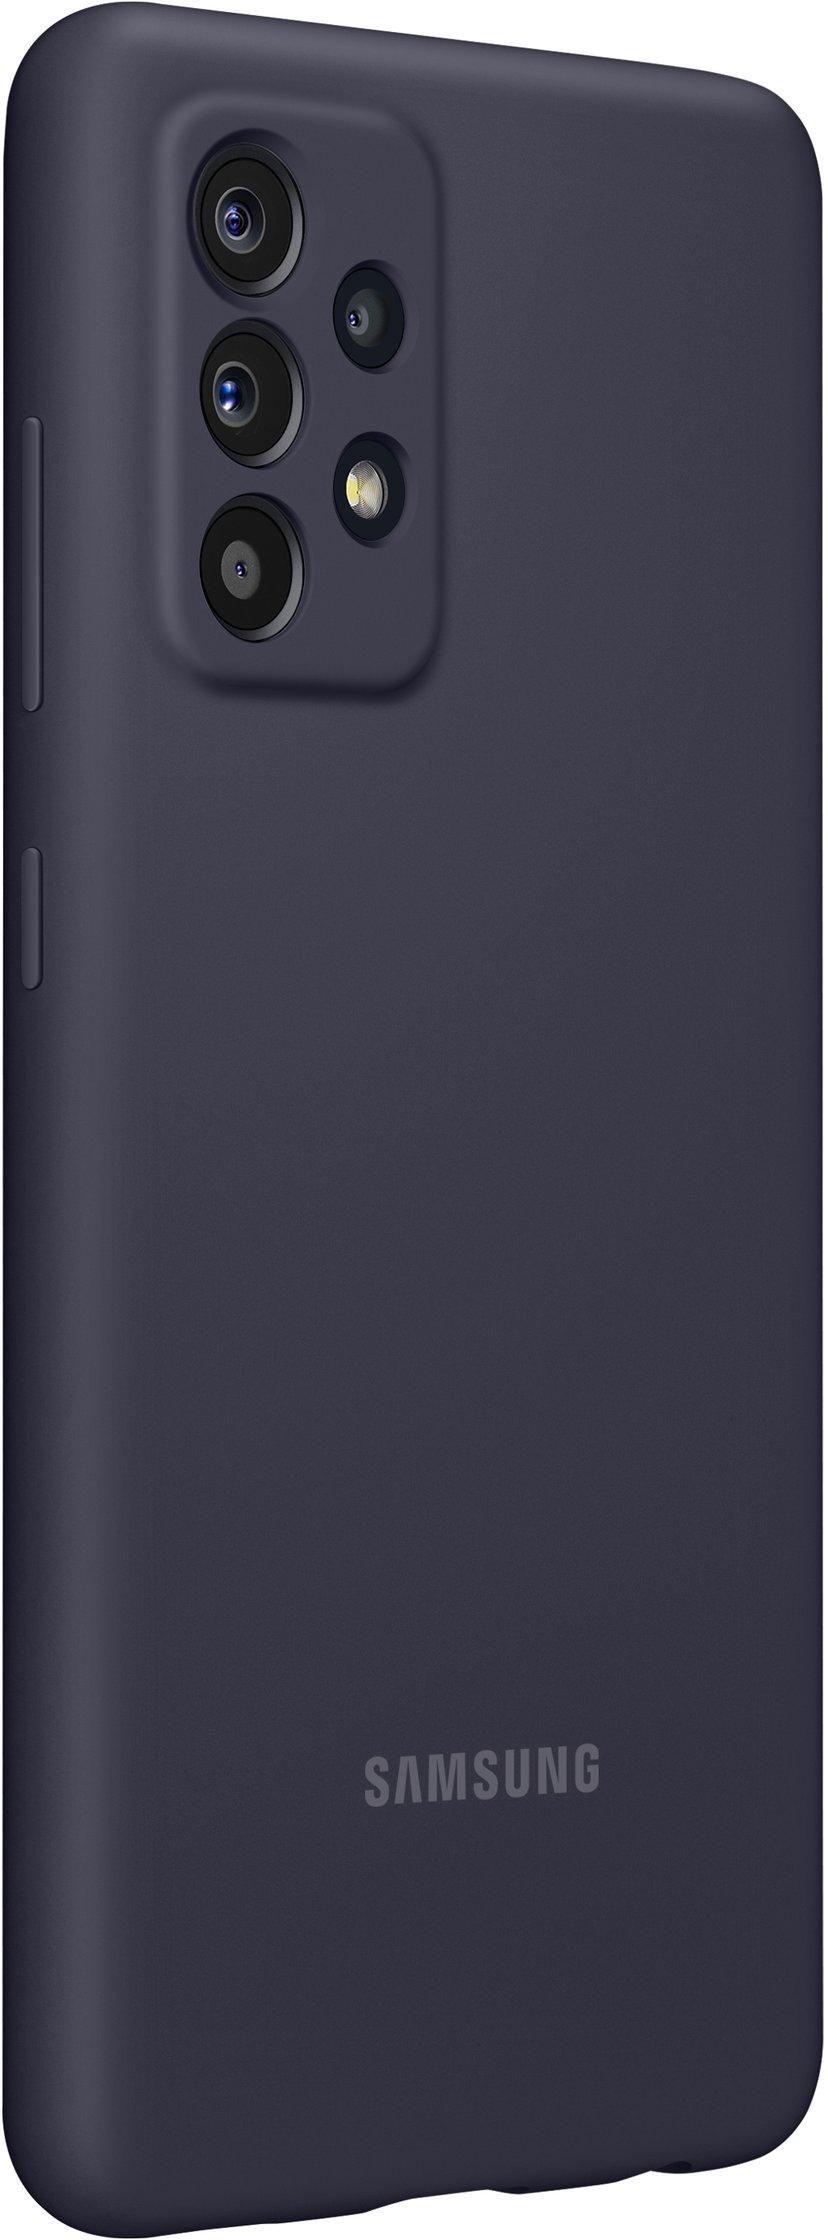 Samsung Silicone Cover Samsung Galaxy A52, Samsung Galaxy A52s Svart